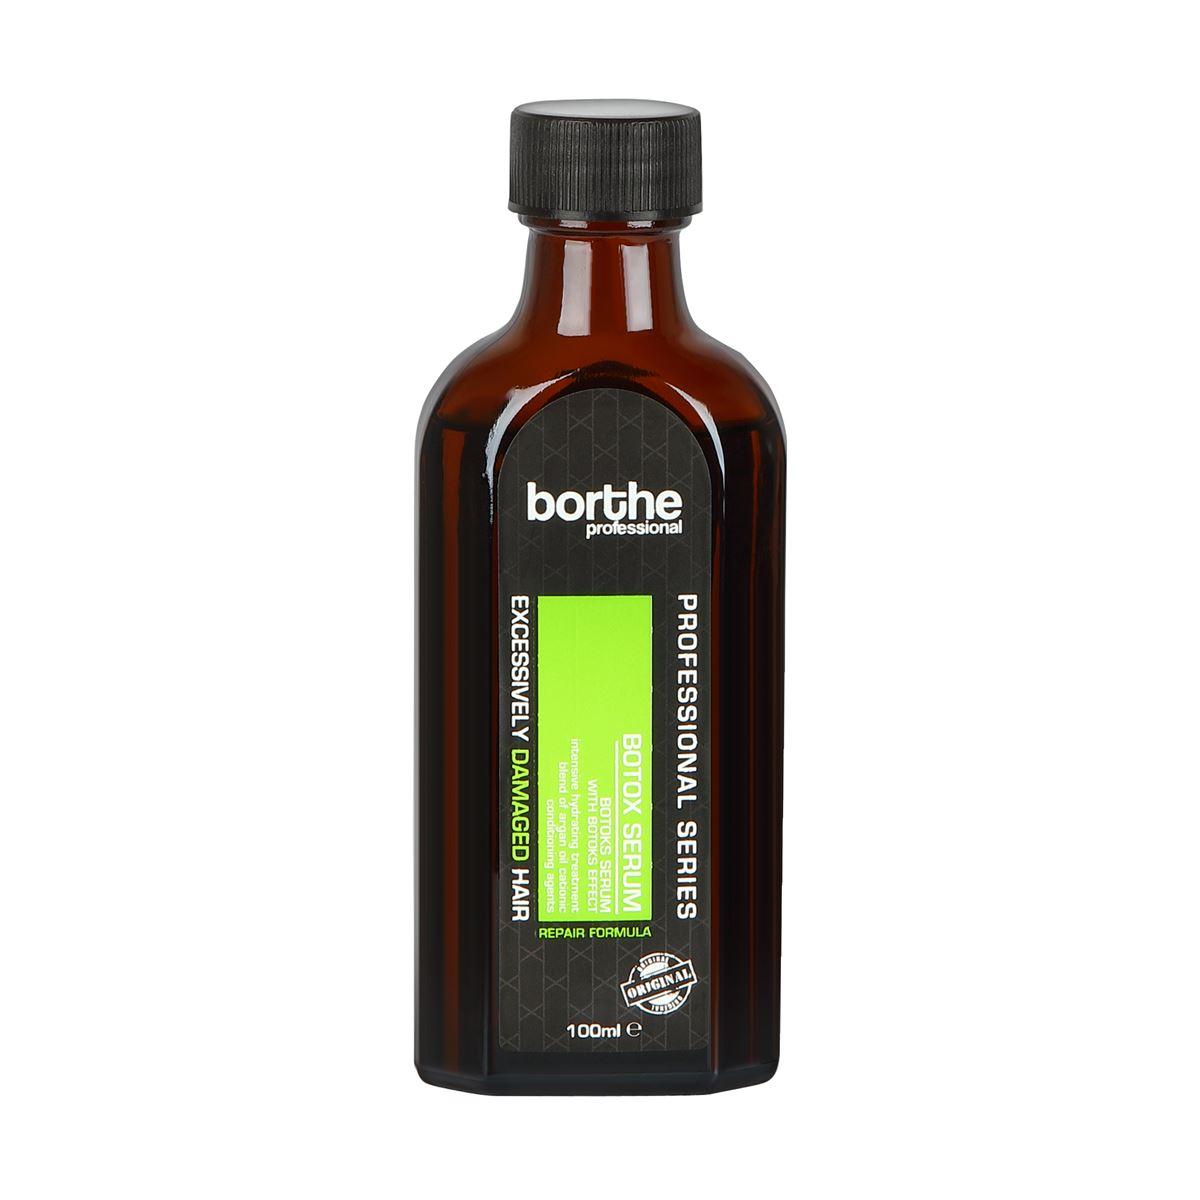 Borthe Saç Serumu Botox 100 ml.